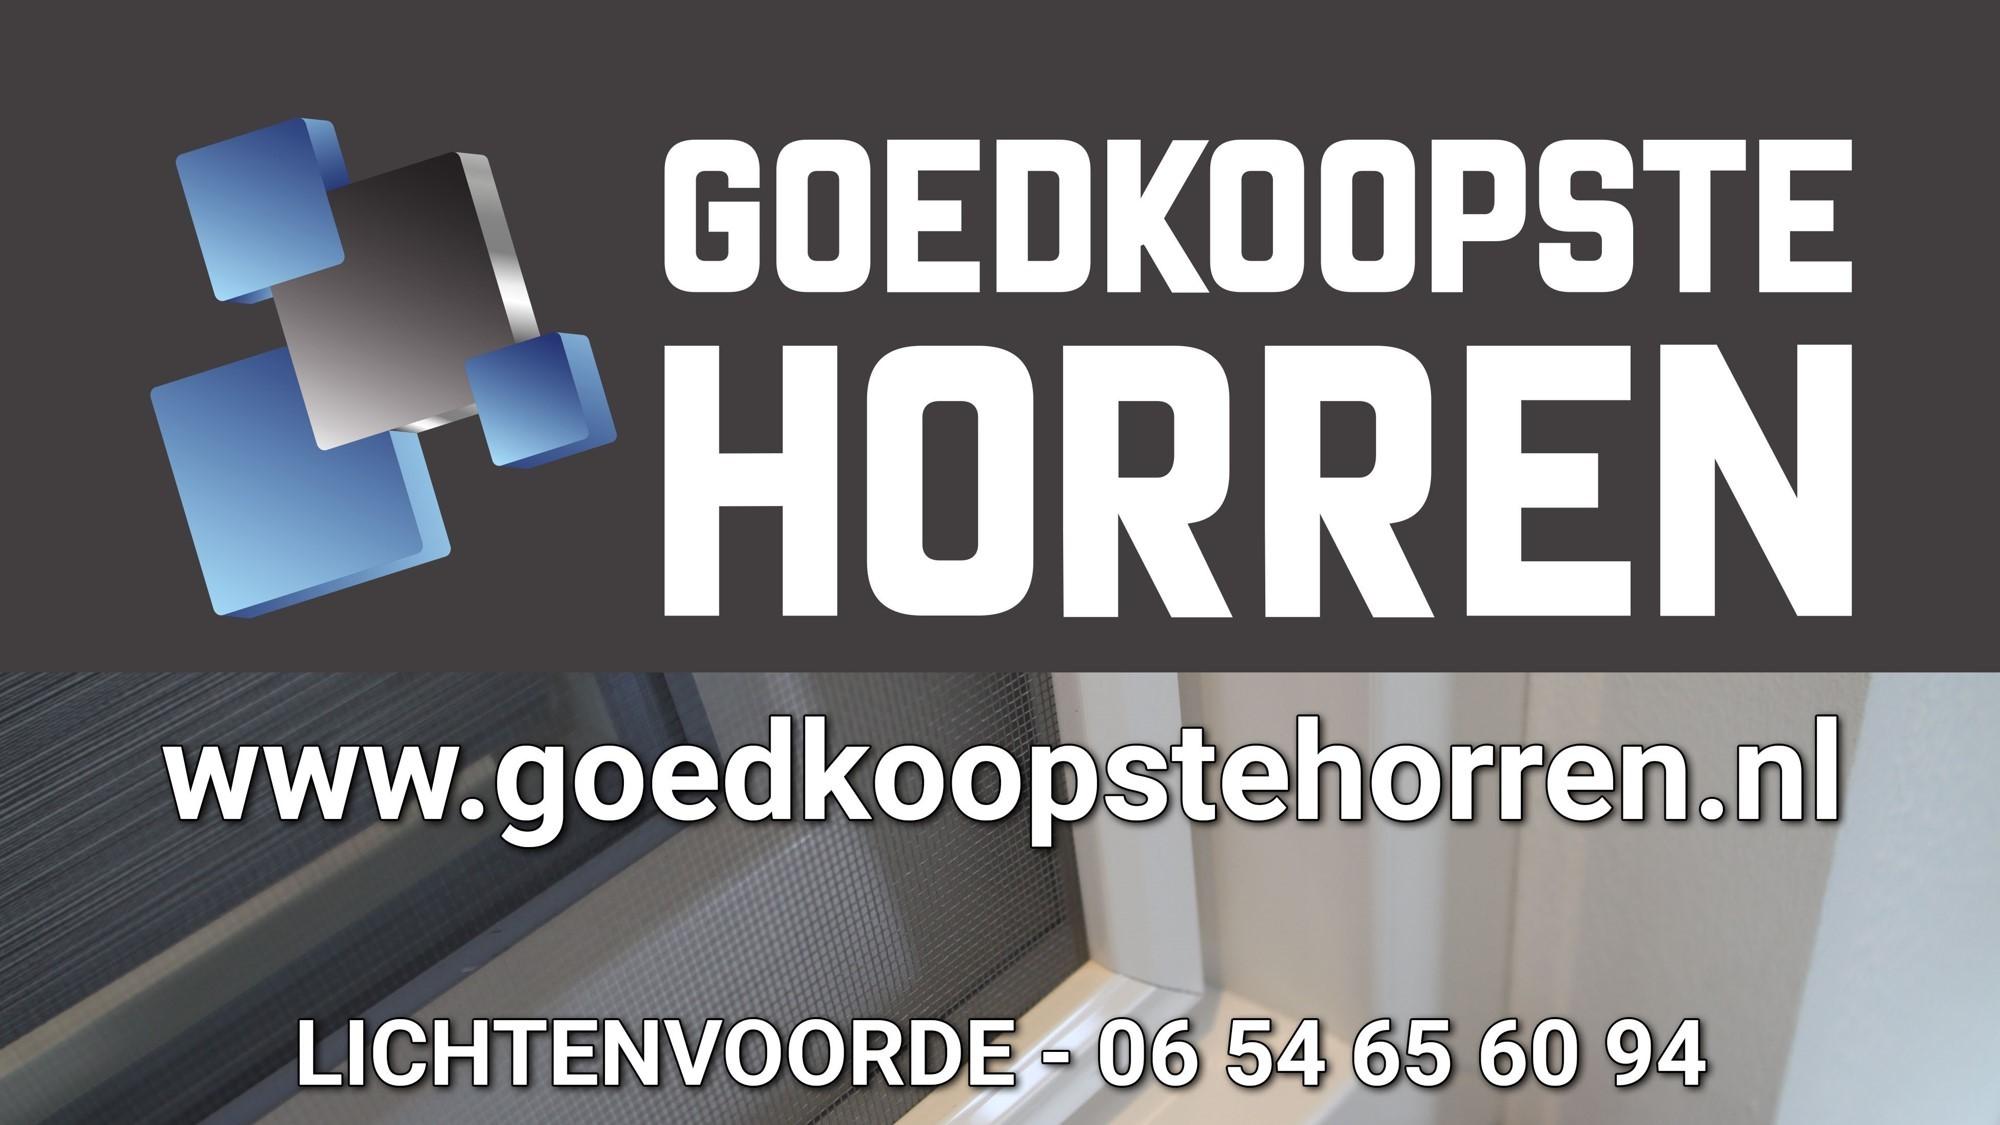 Goedkoopstehorren.nl